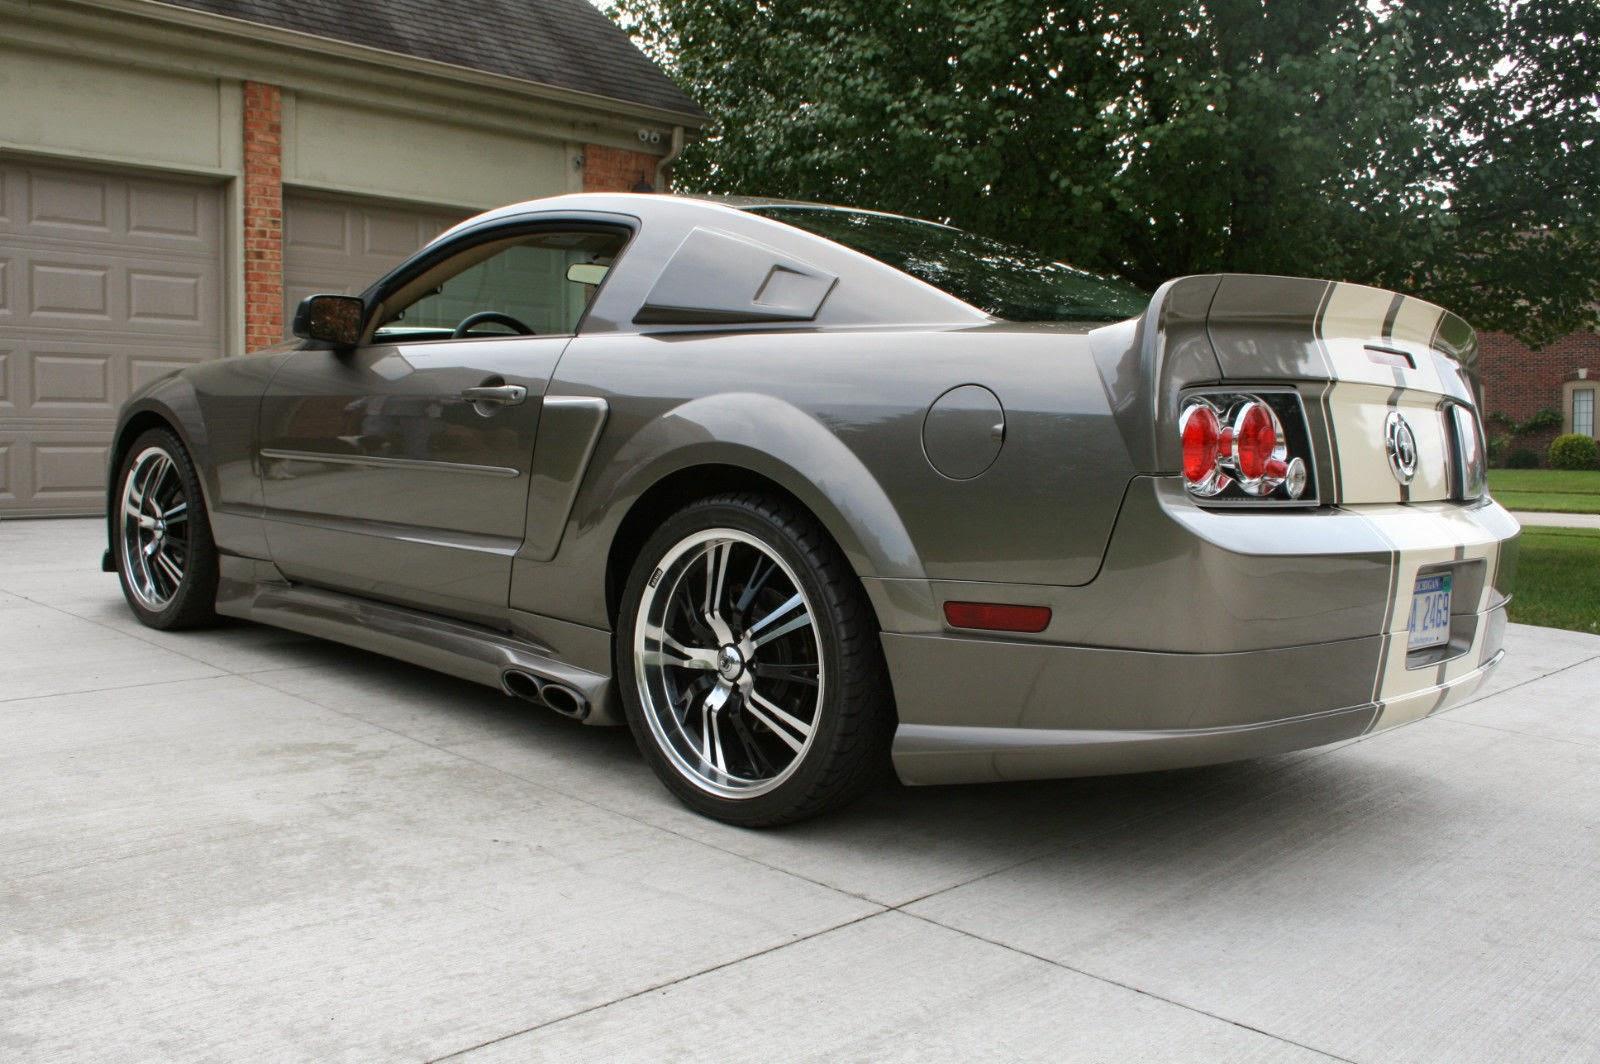 2005 Custom Ford Mustang Eleanor Cervini Twin Turbo V6